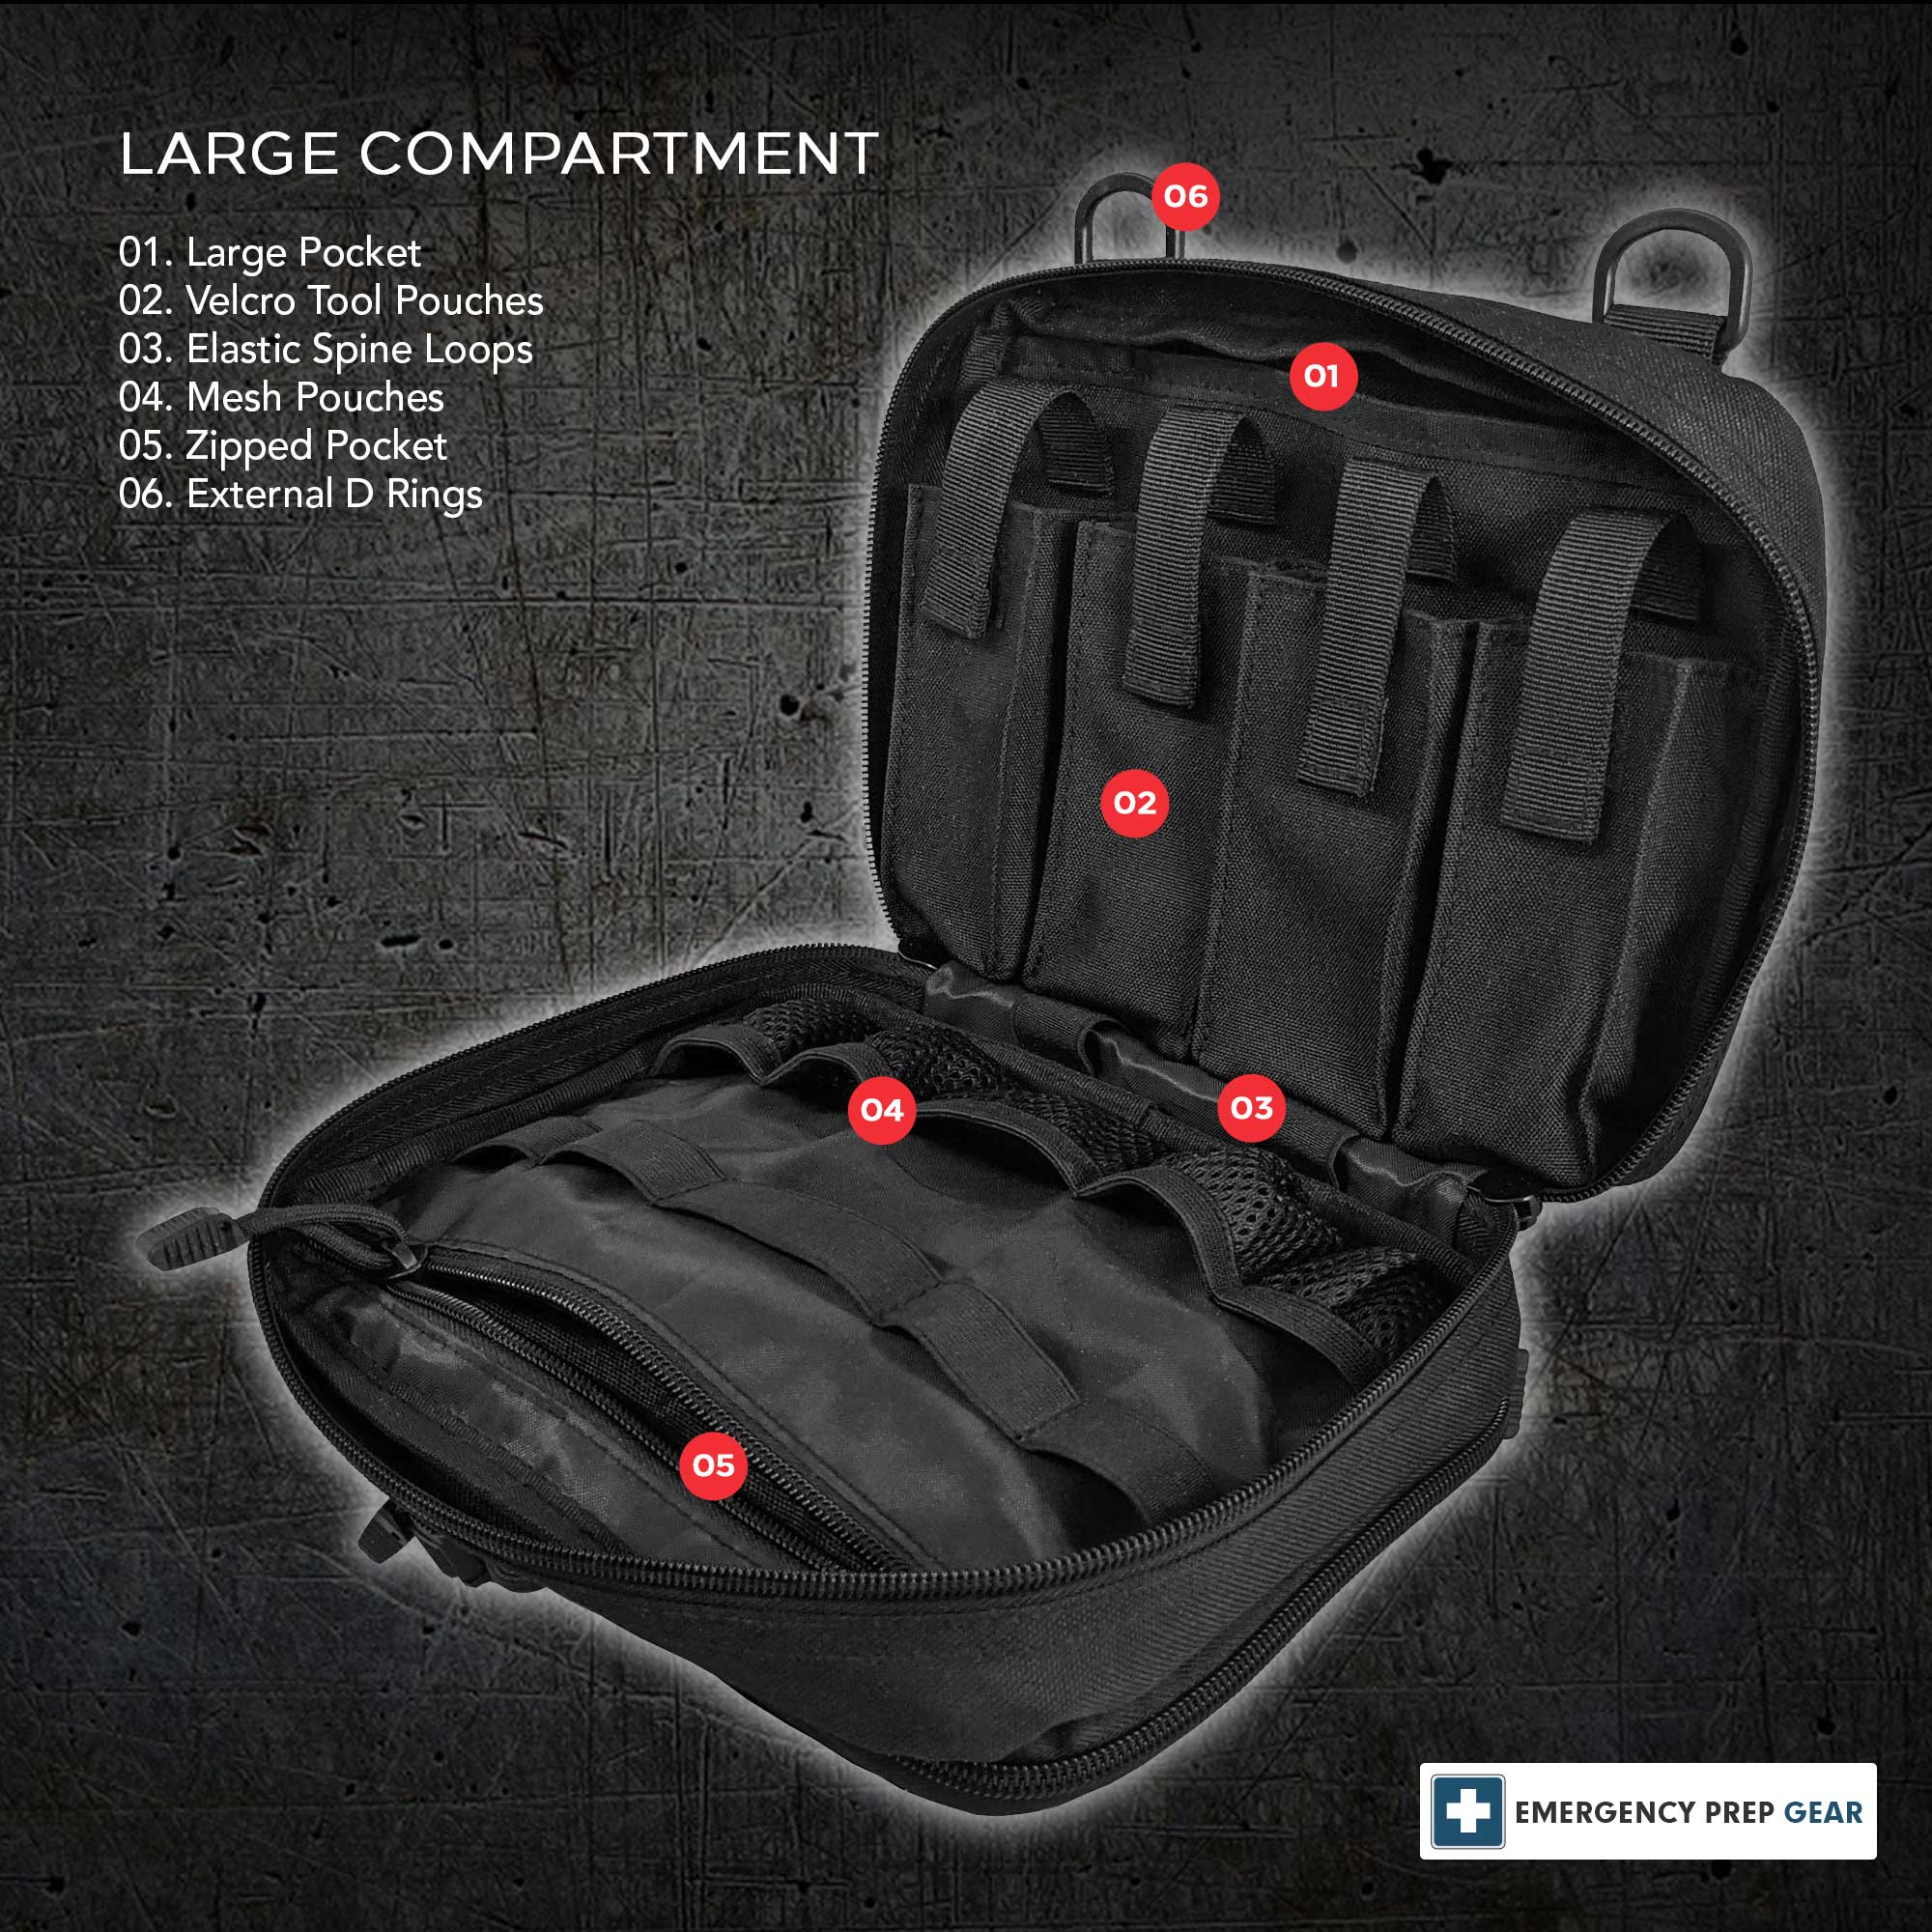 21 10 01 14 38 28 original b09dqz9vnl epg gear black compartment1